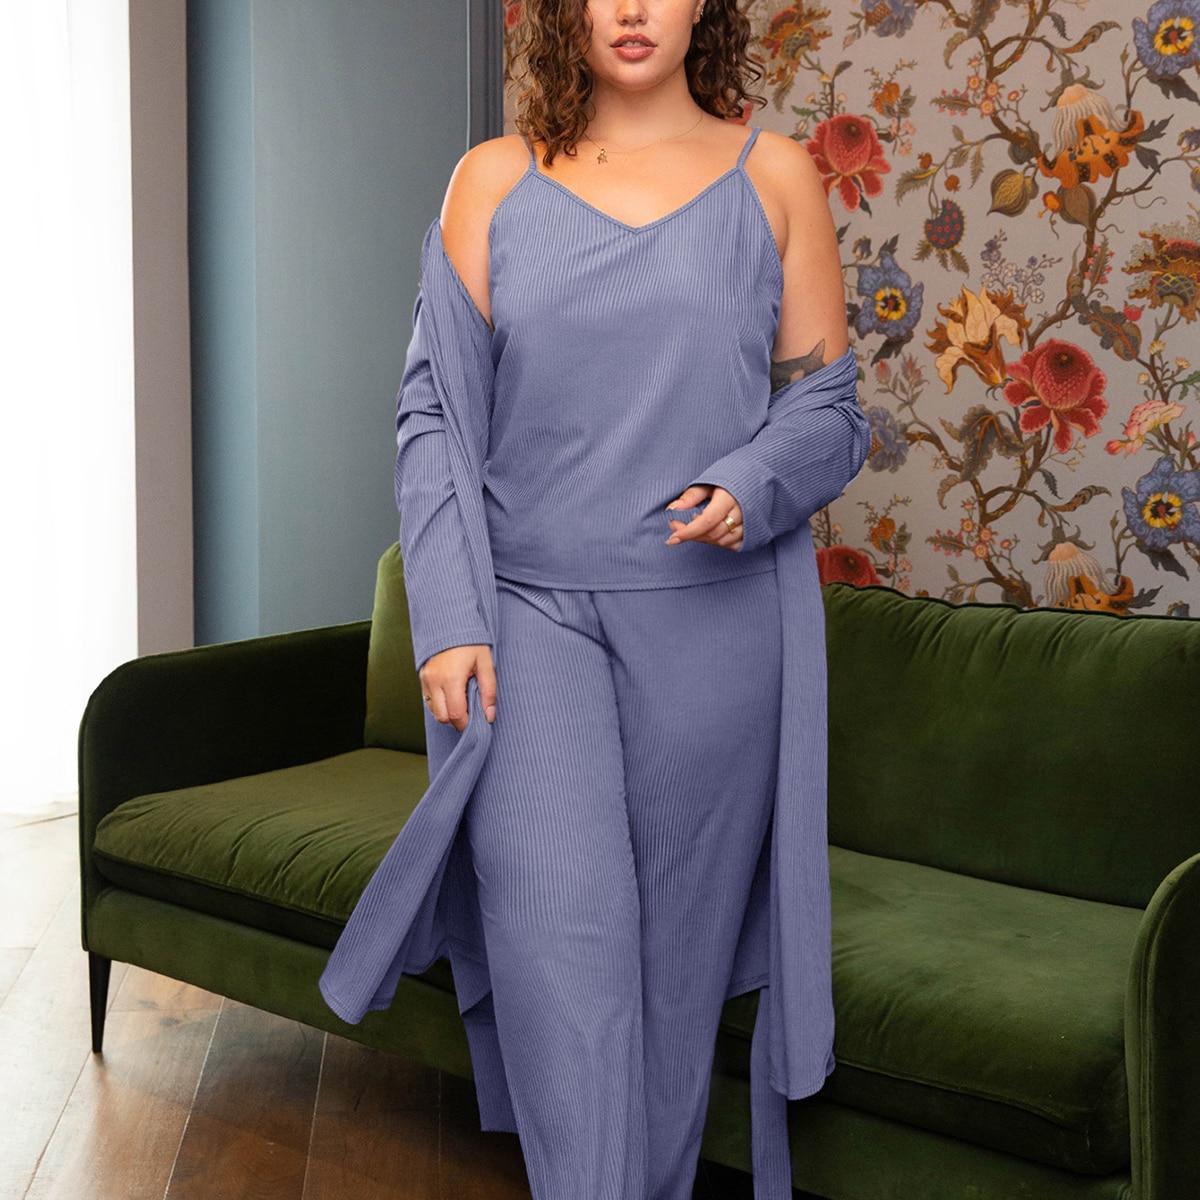 Вязаная пижама из майки и брюк в рубчик размера плюс без халата